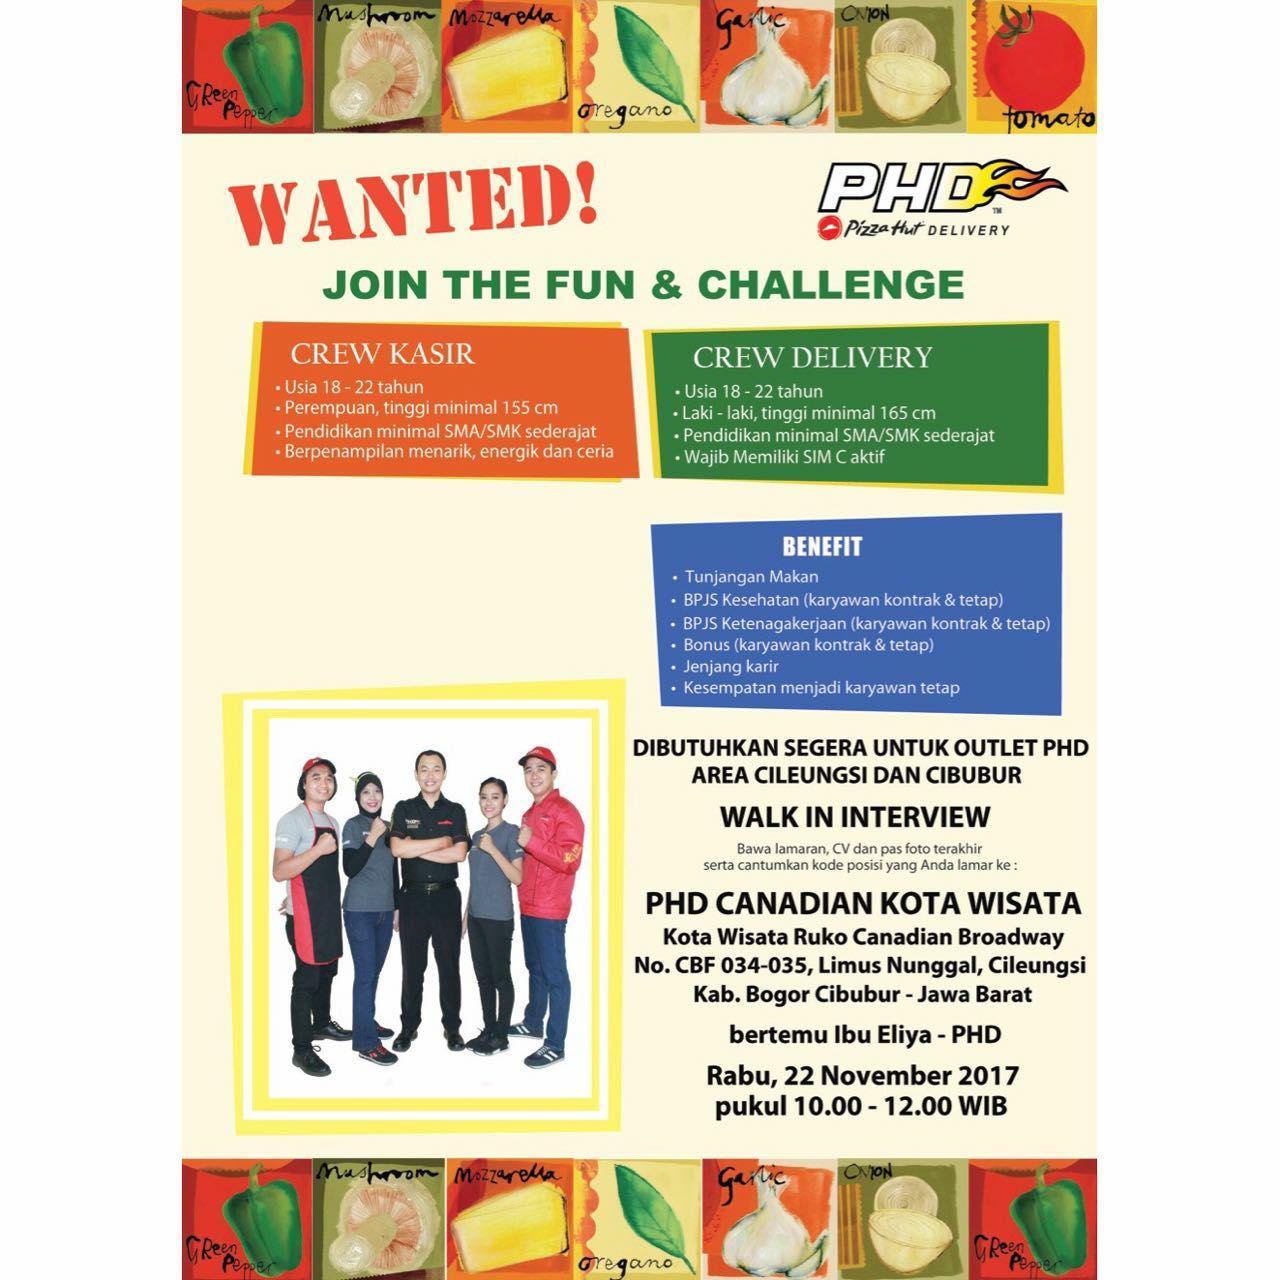 Lowongan Kerja Pizza Hut Delivery ( Walk In Interveiw ) 22 November 2017